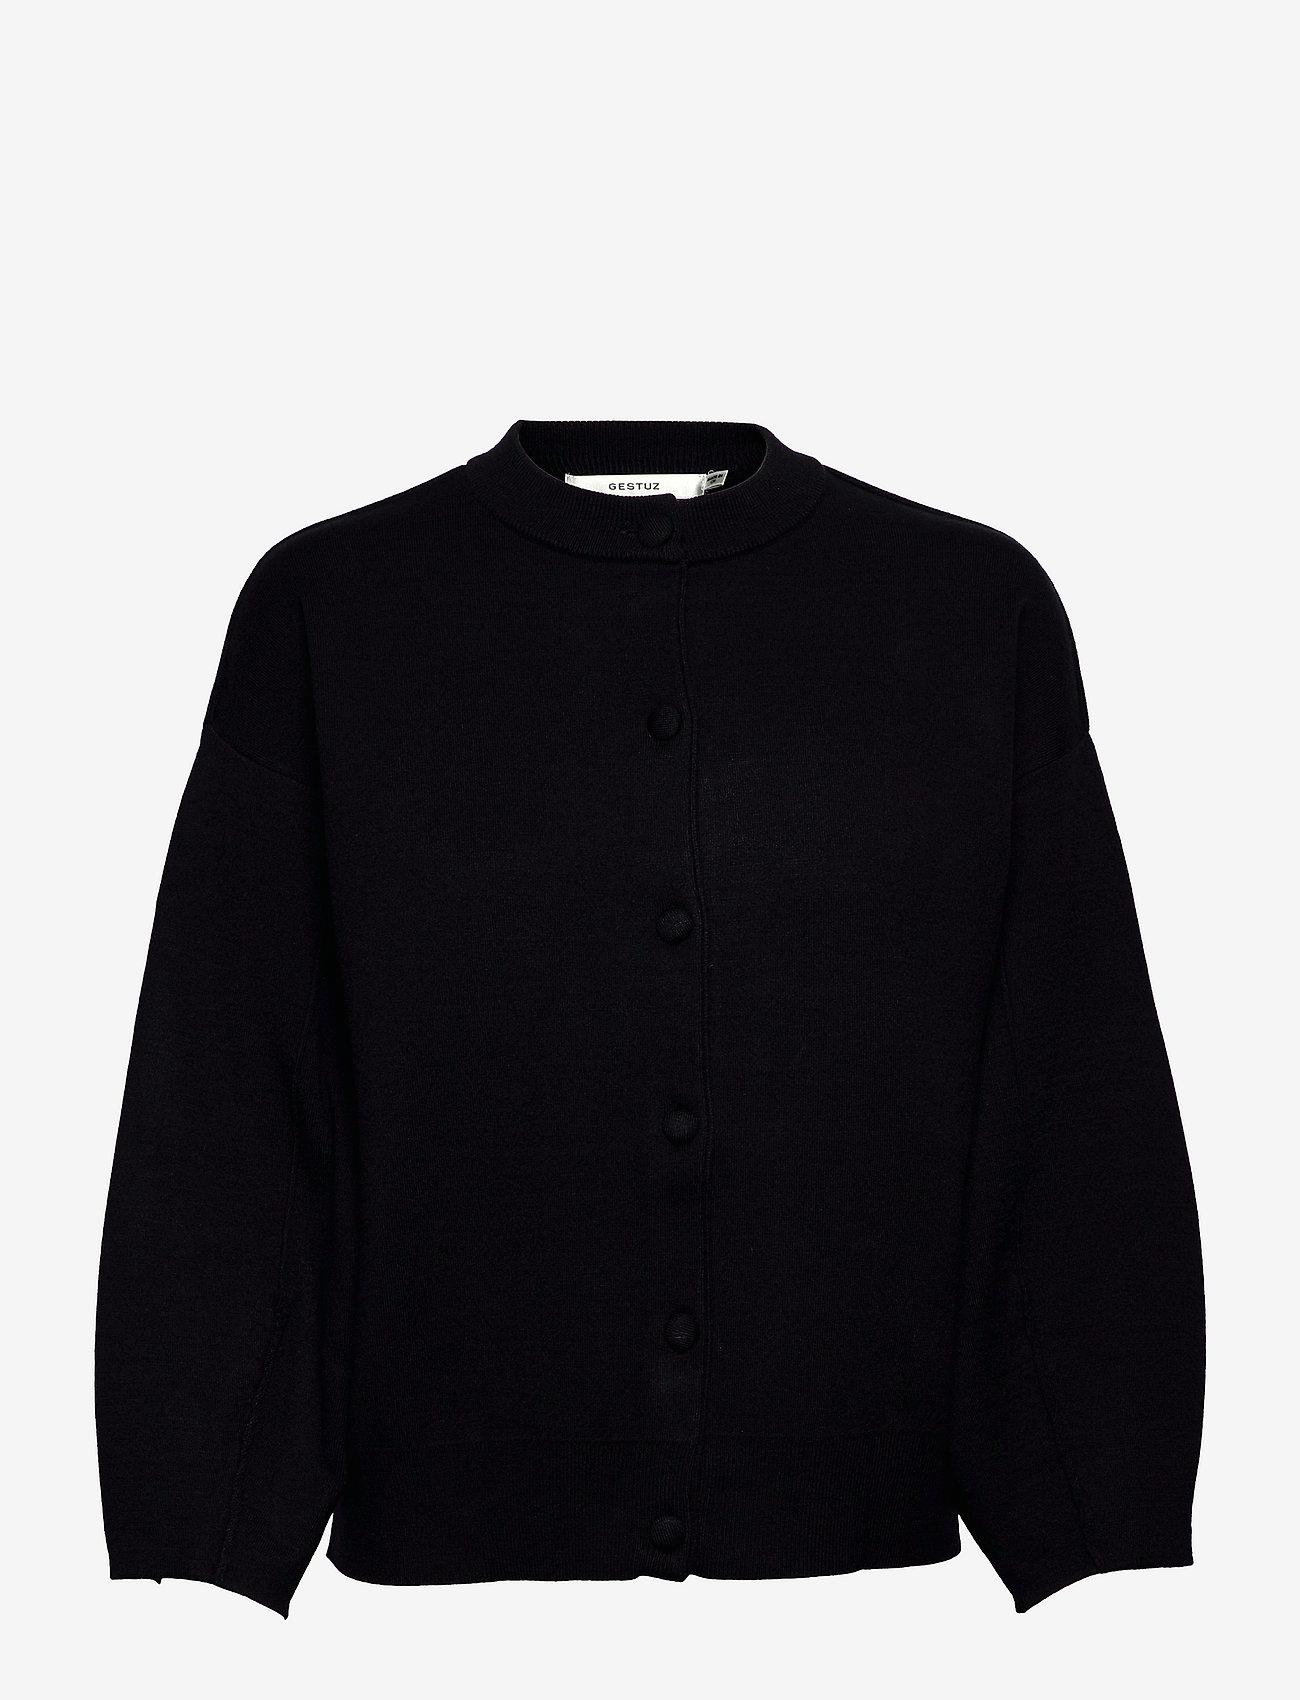 Gestuz - TalliGZ box cardigan - cardigans - black - 1